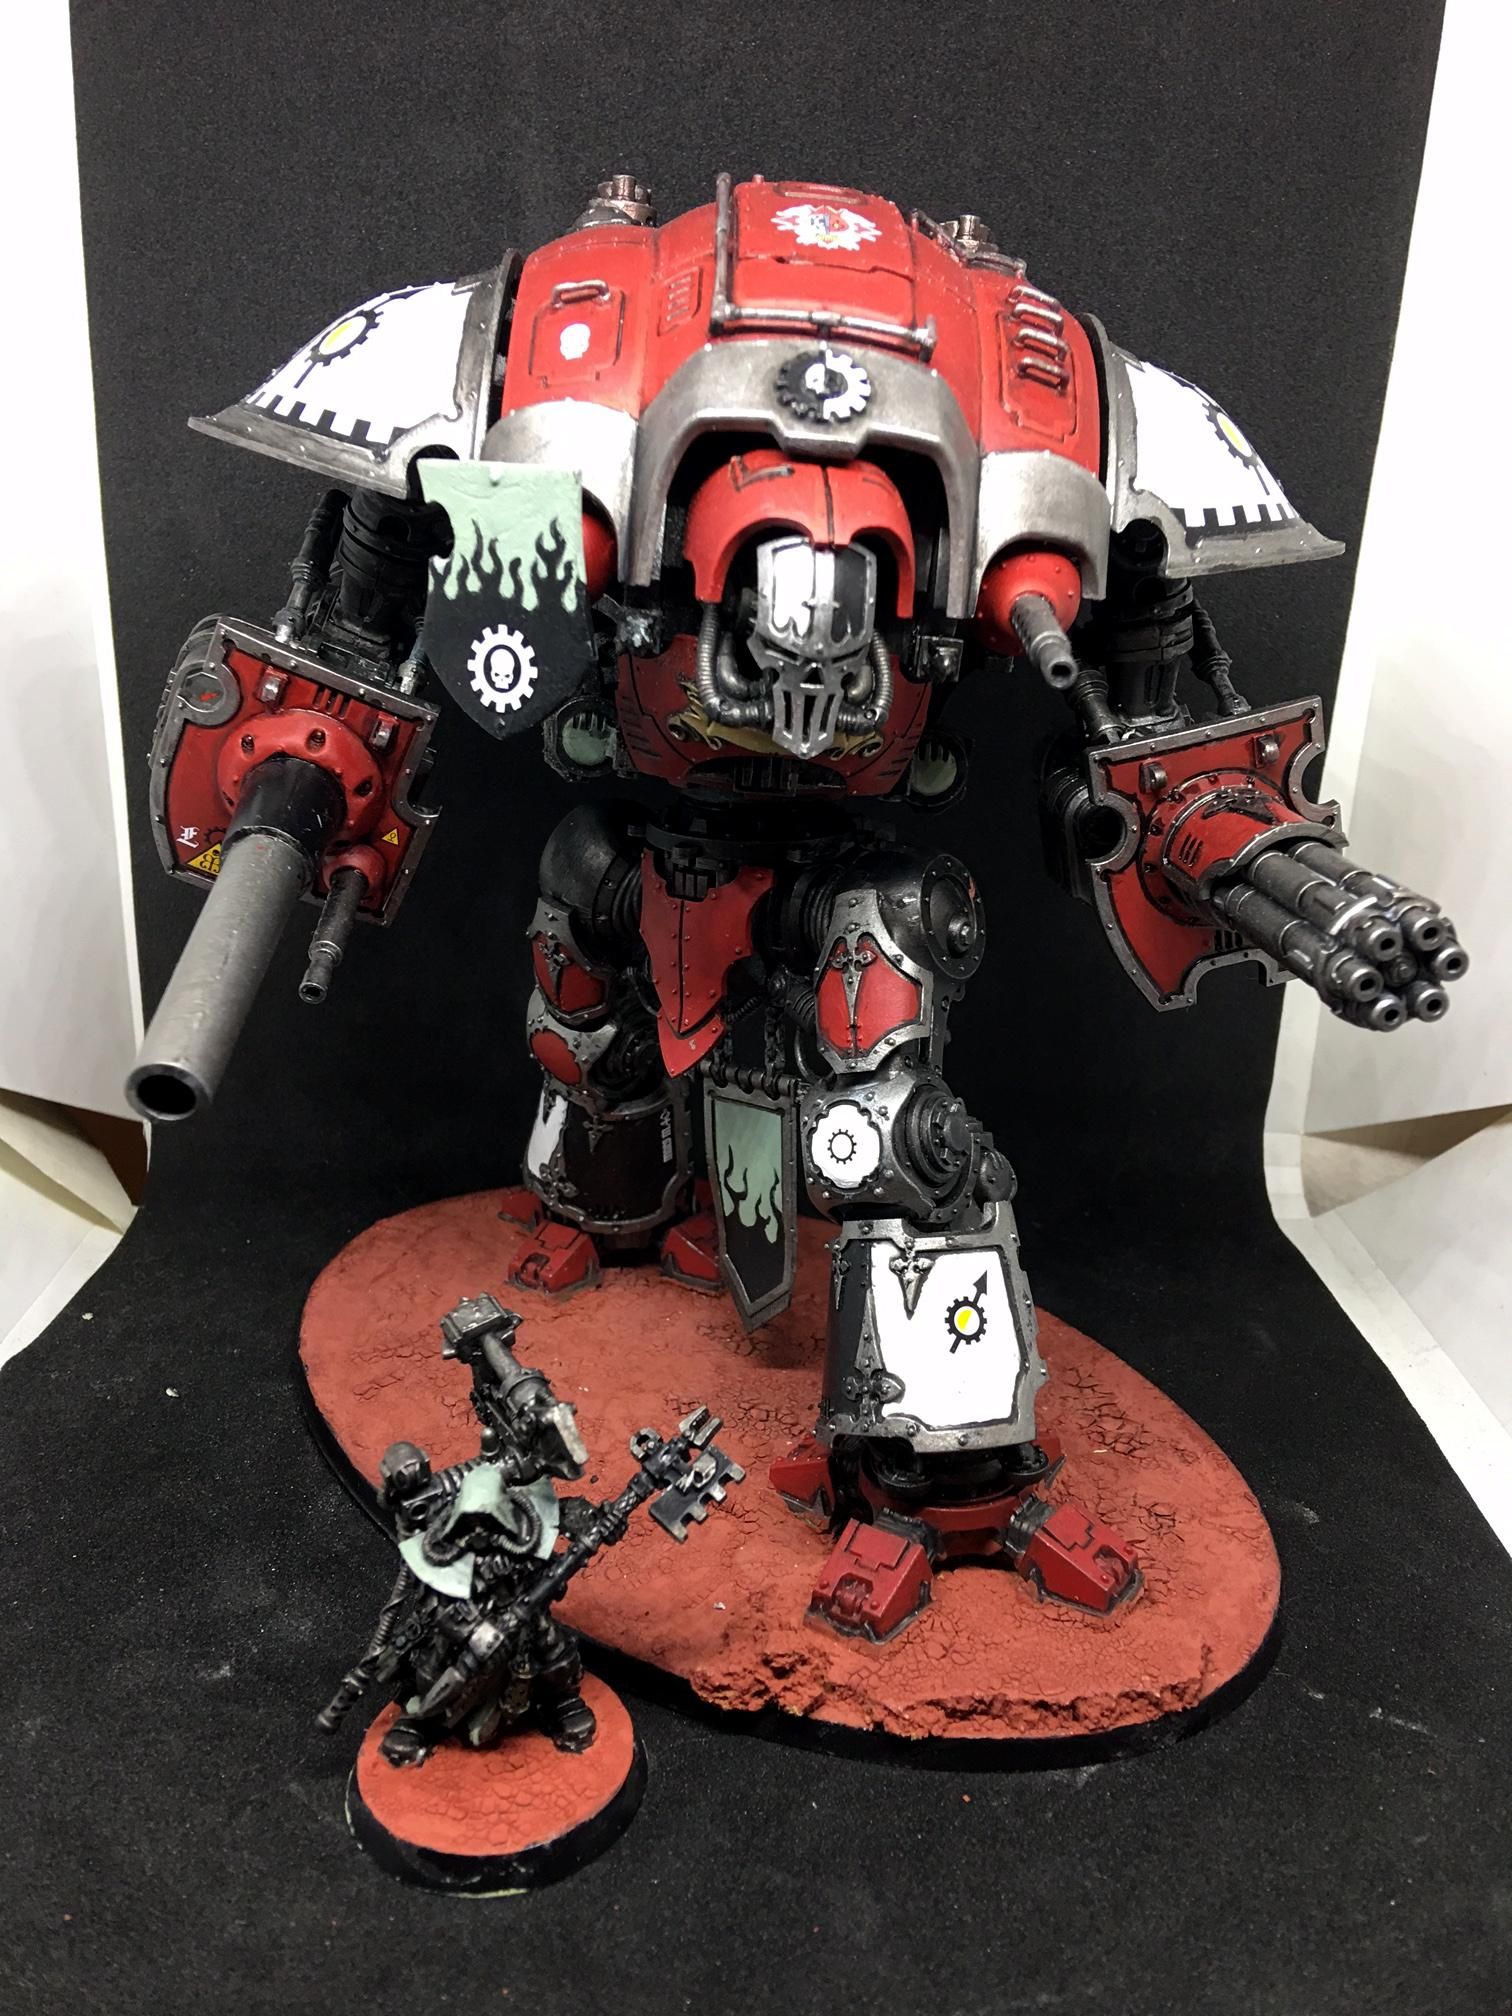 Adeptus Mechanicus, Imperial Knight, Taranis, Warhammer 40,000